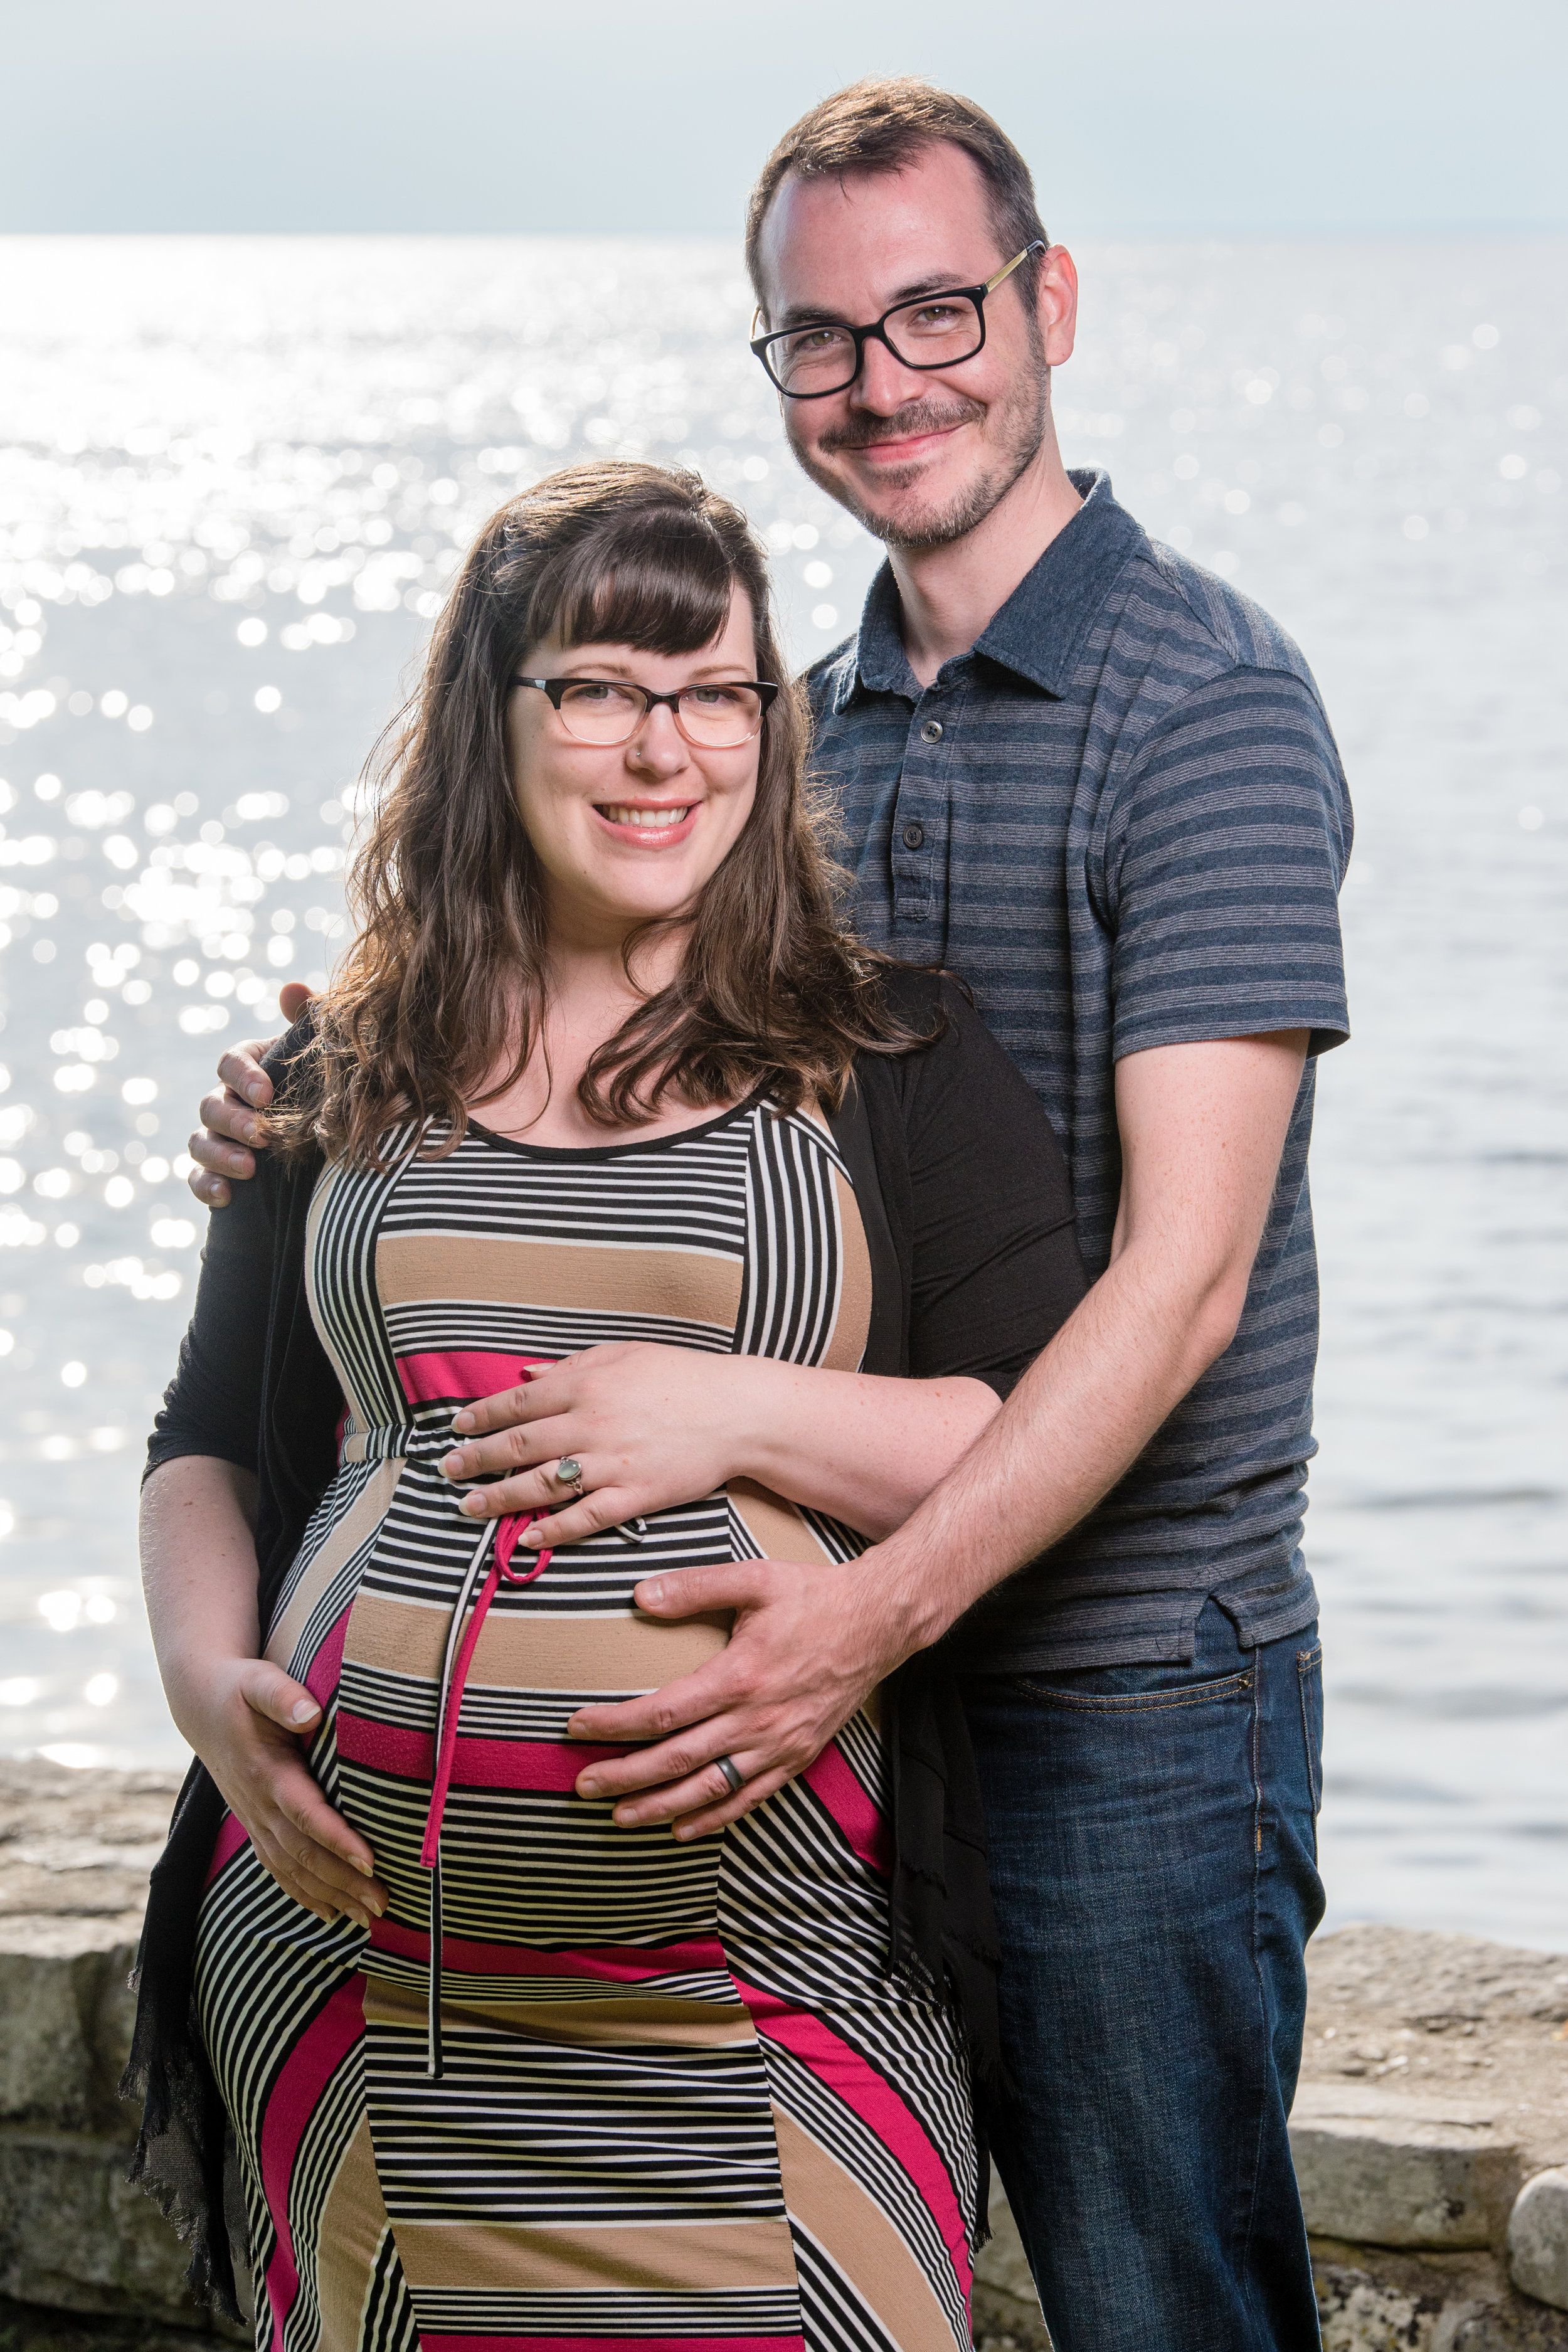 2018_June_23-06_23_2018_Ben_Anna_Maternity-48906-Edit.jpg